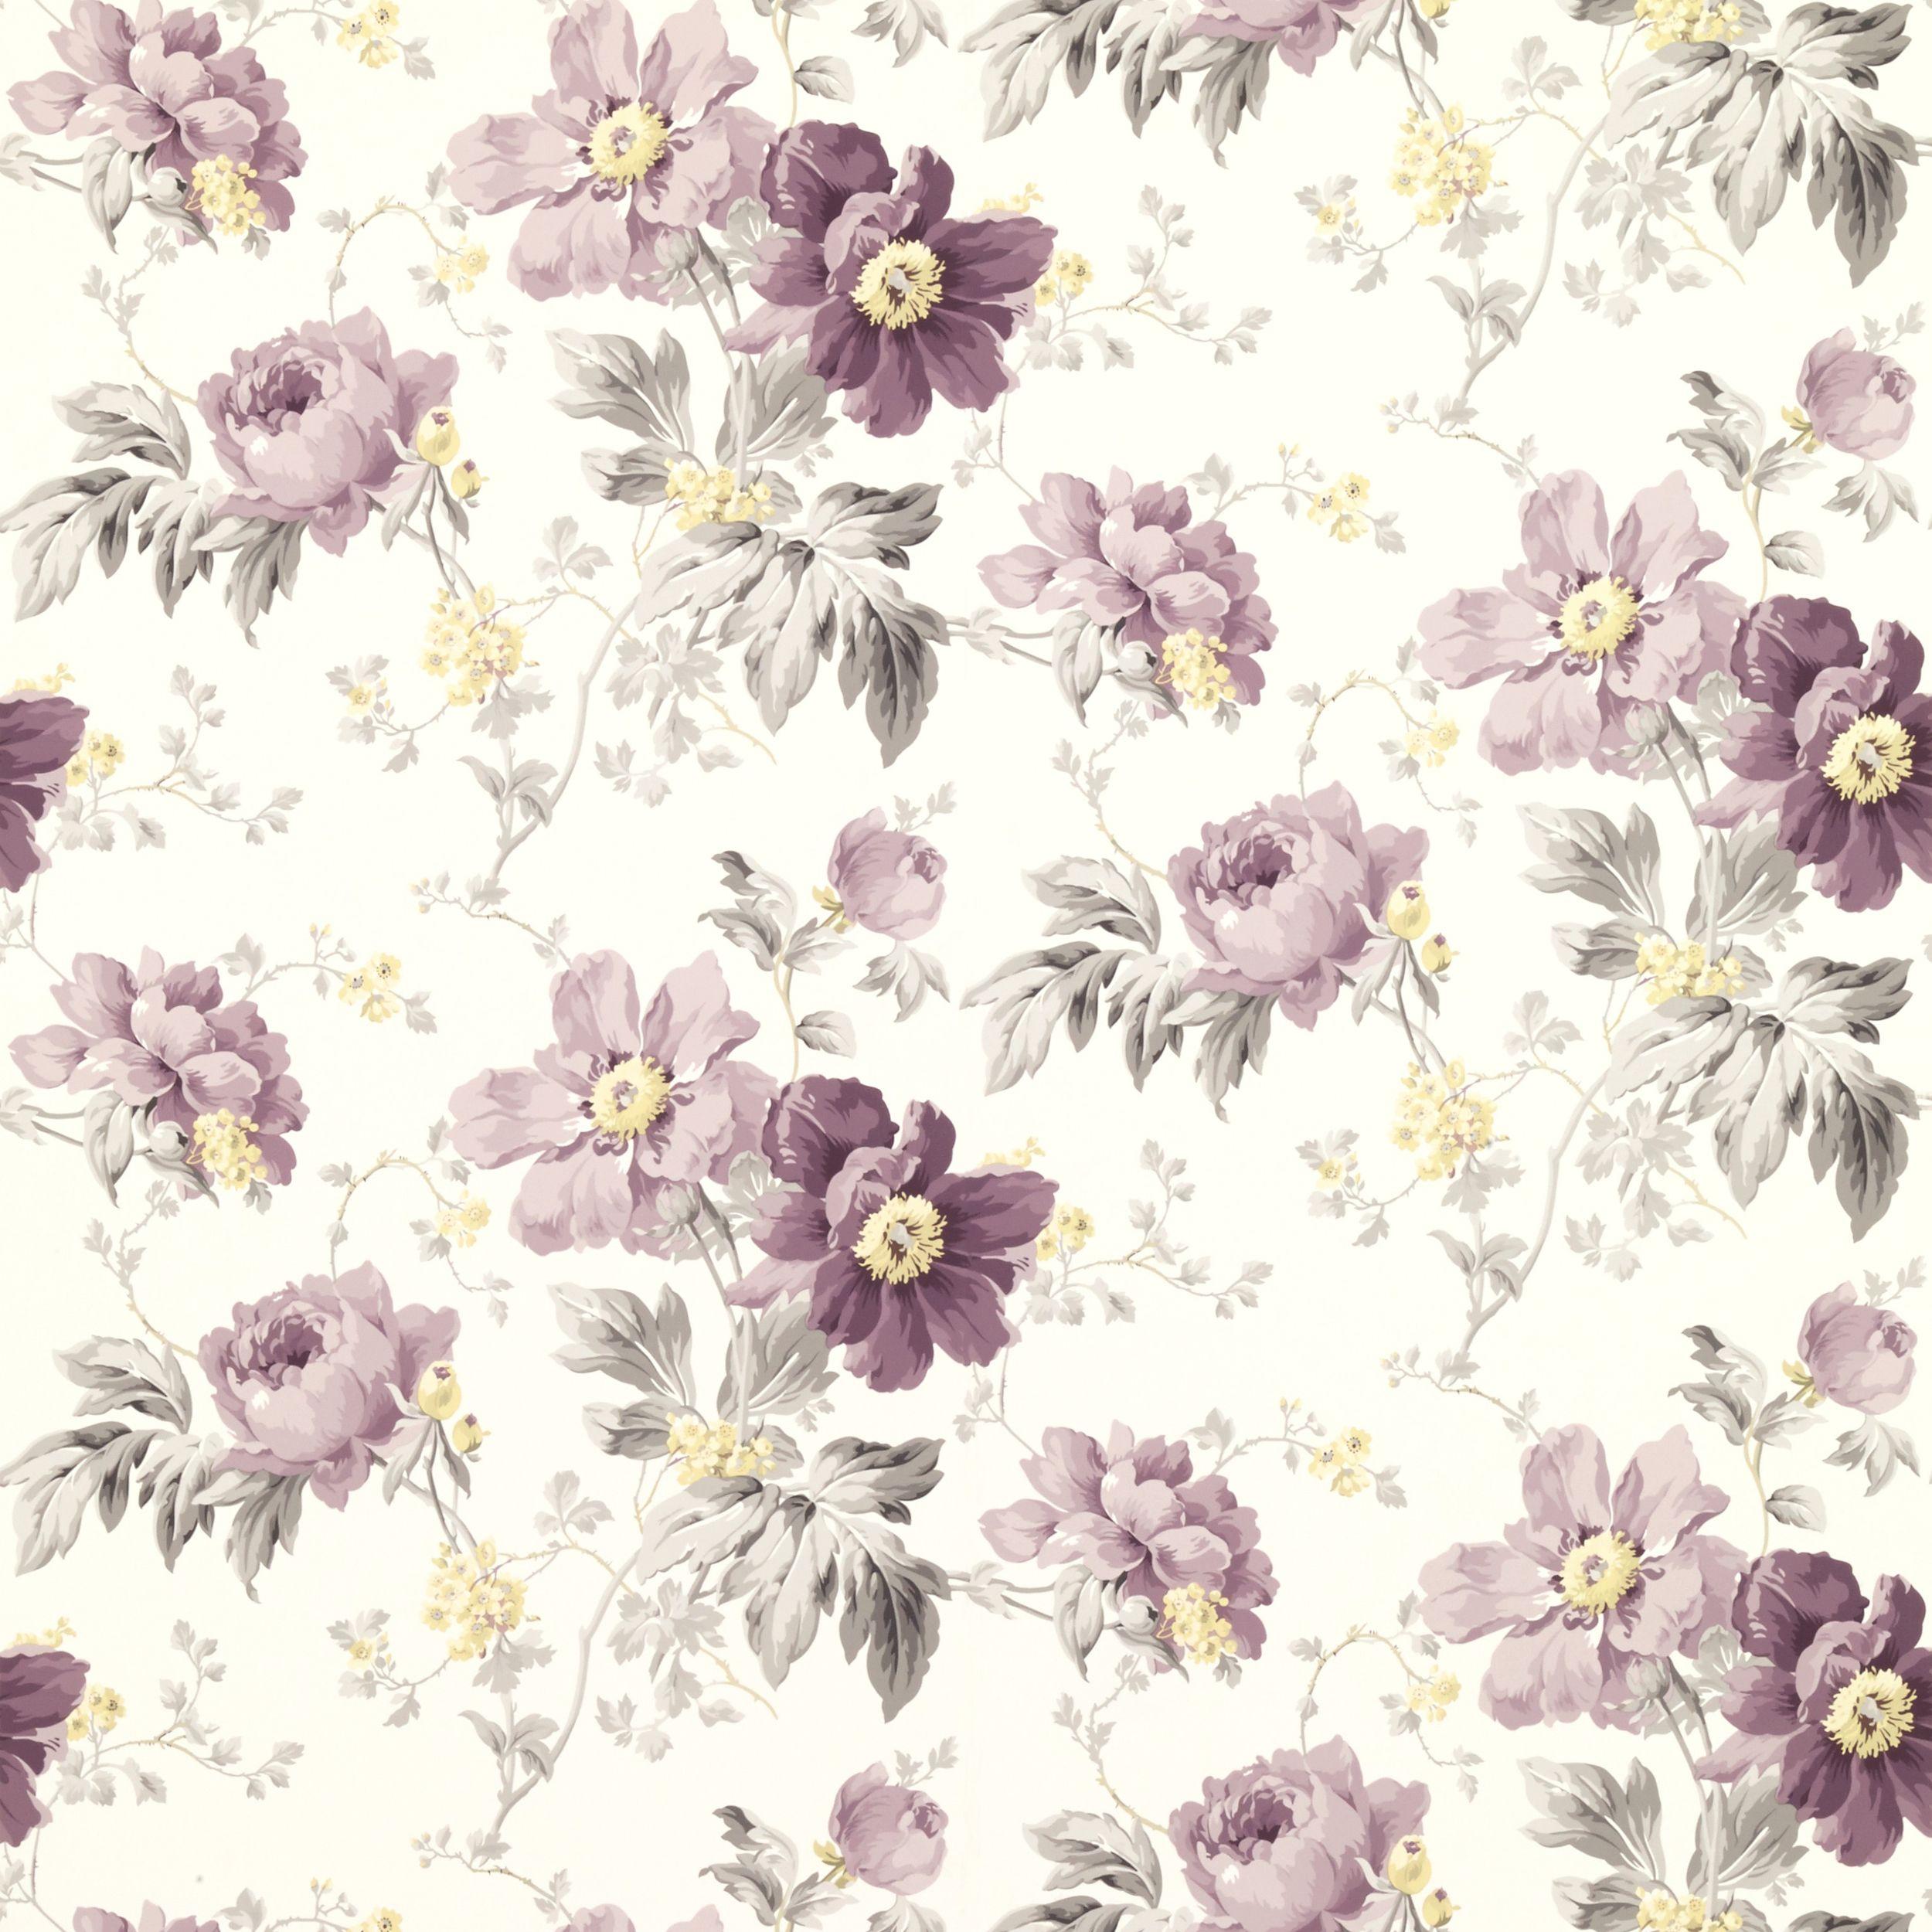 peony garden wallpaper wallpaper laura ashley and decoupage. Black Bedroom Furniture Sets. Home Design Ideas